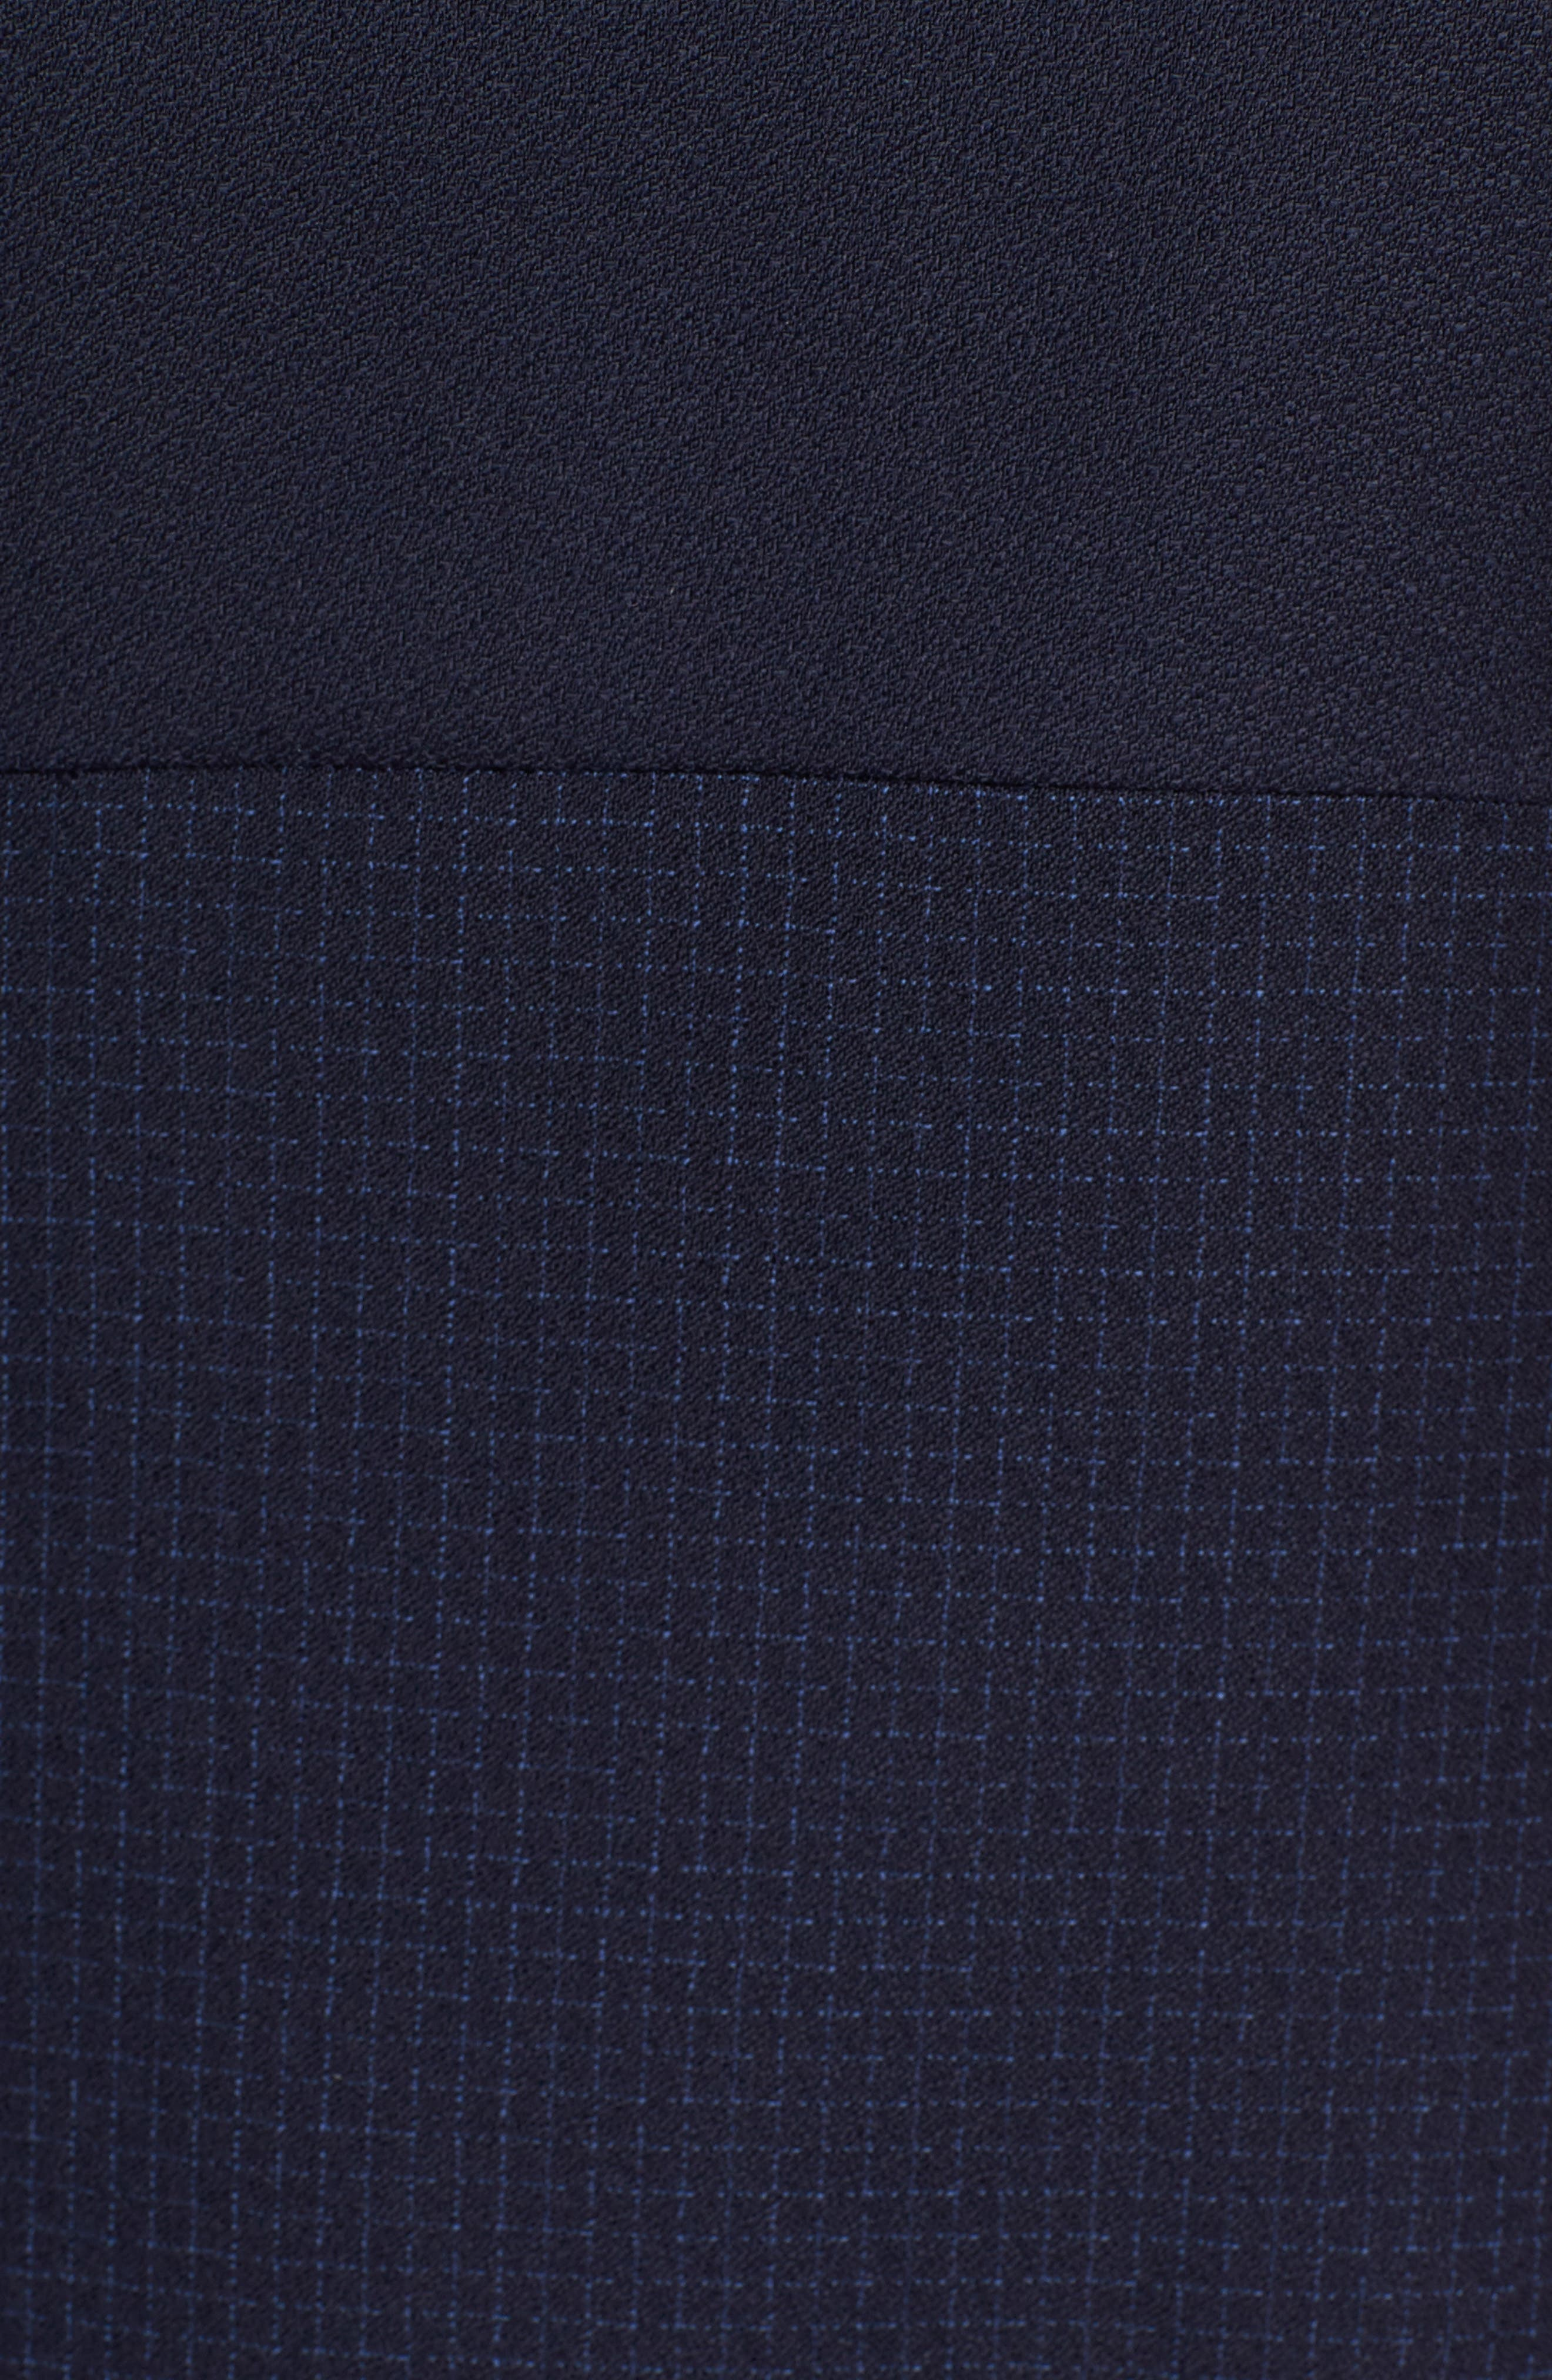 Dibena Windowpane Sheath Dress,                             Alternate thumbnail 6, color,                             462